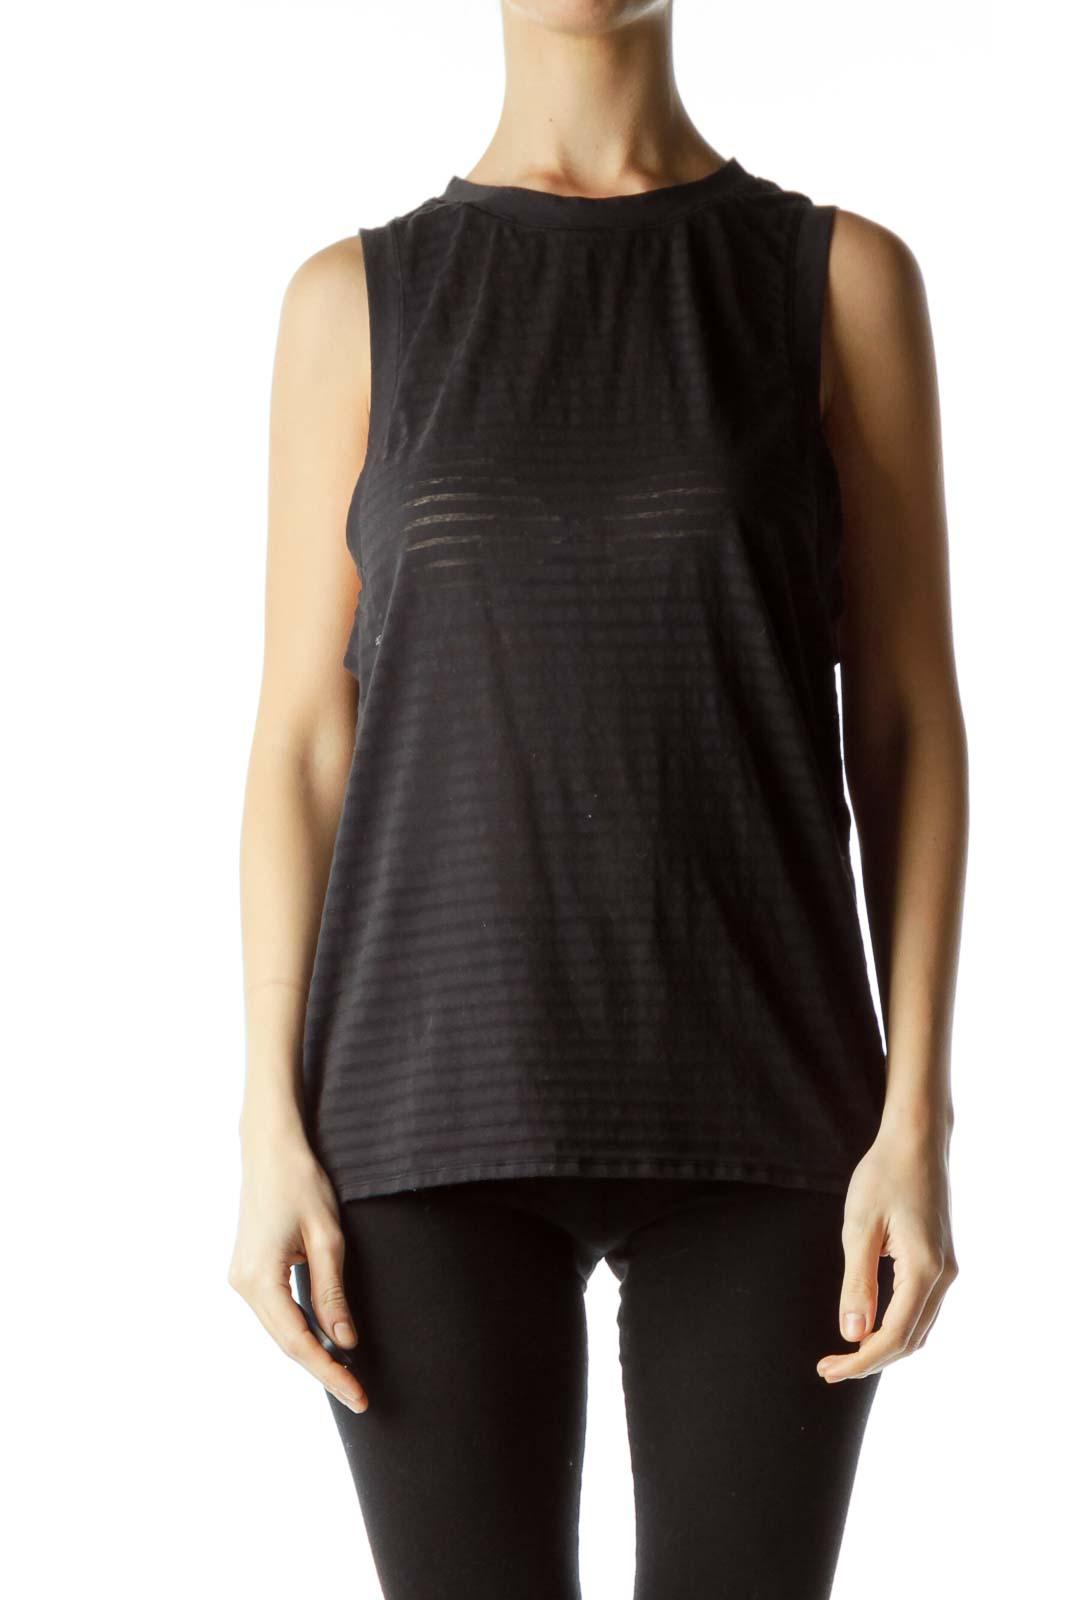 Black Round Neck Sleeveless Sports Top